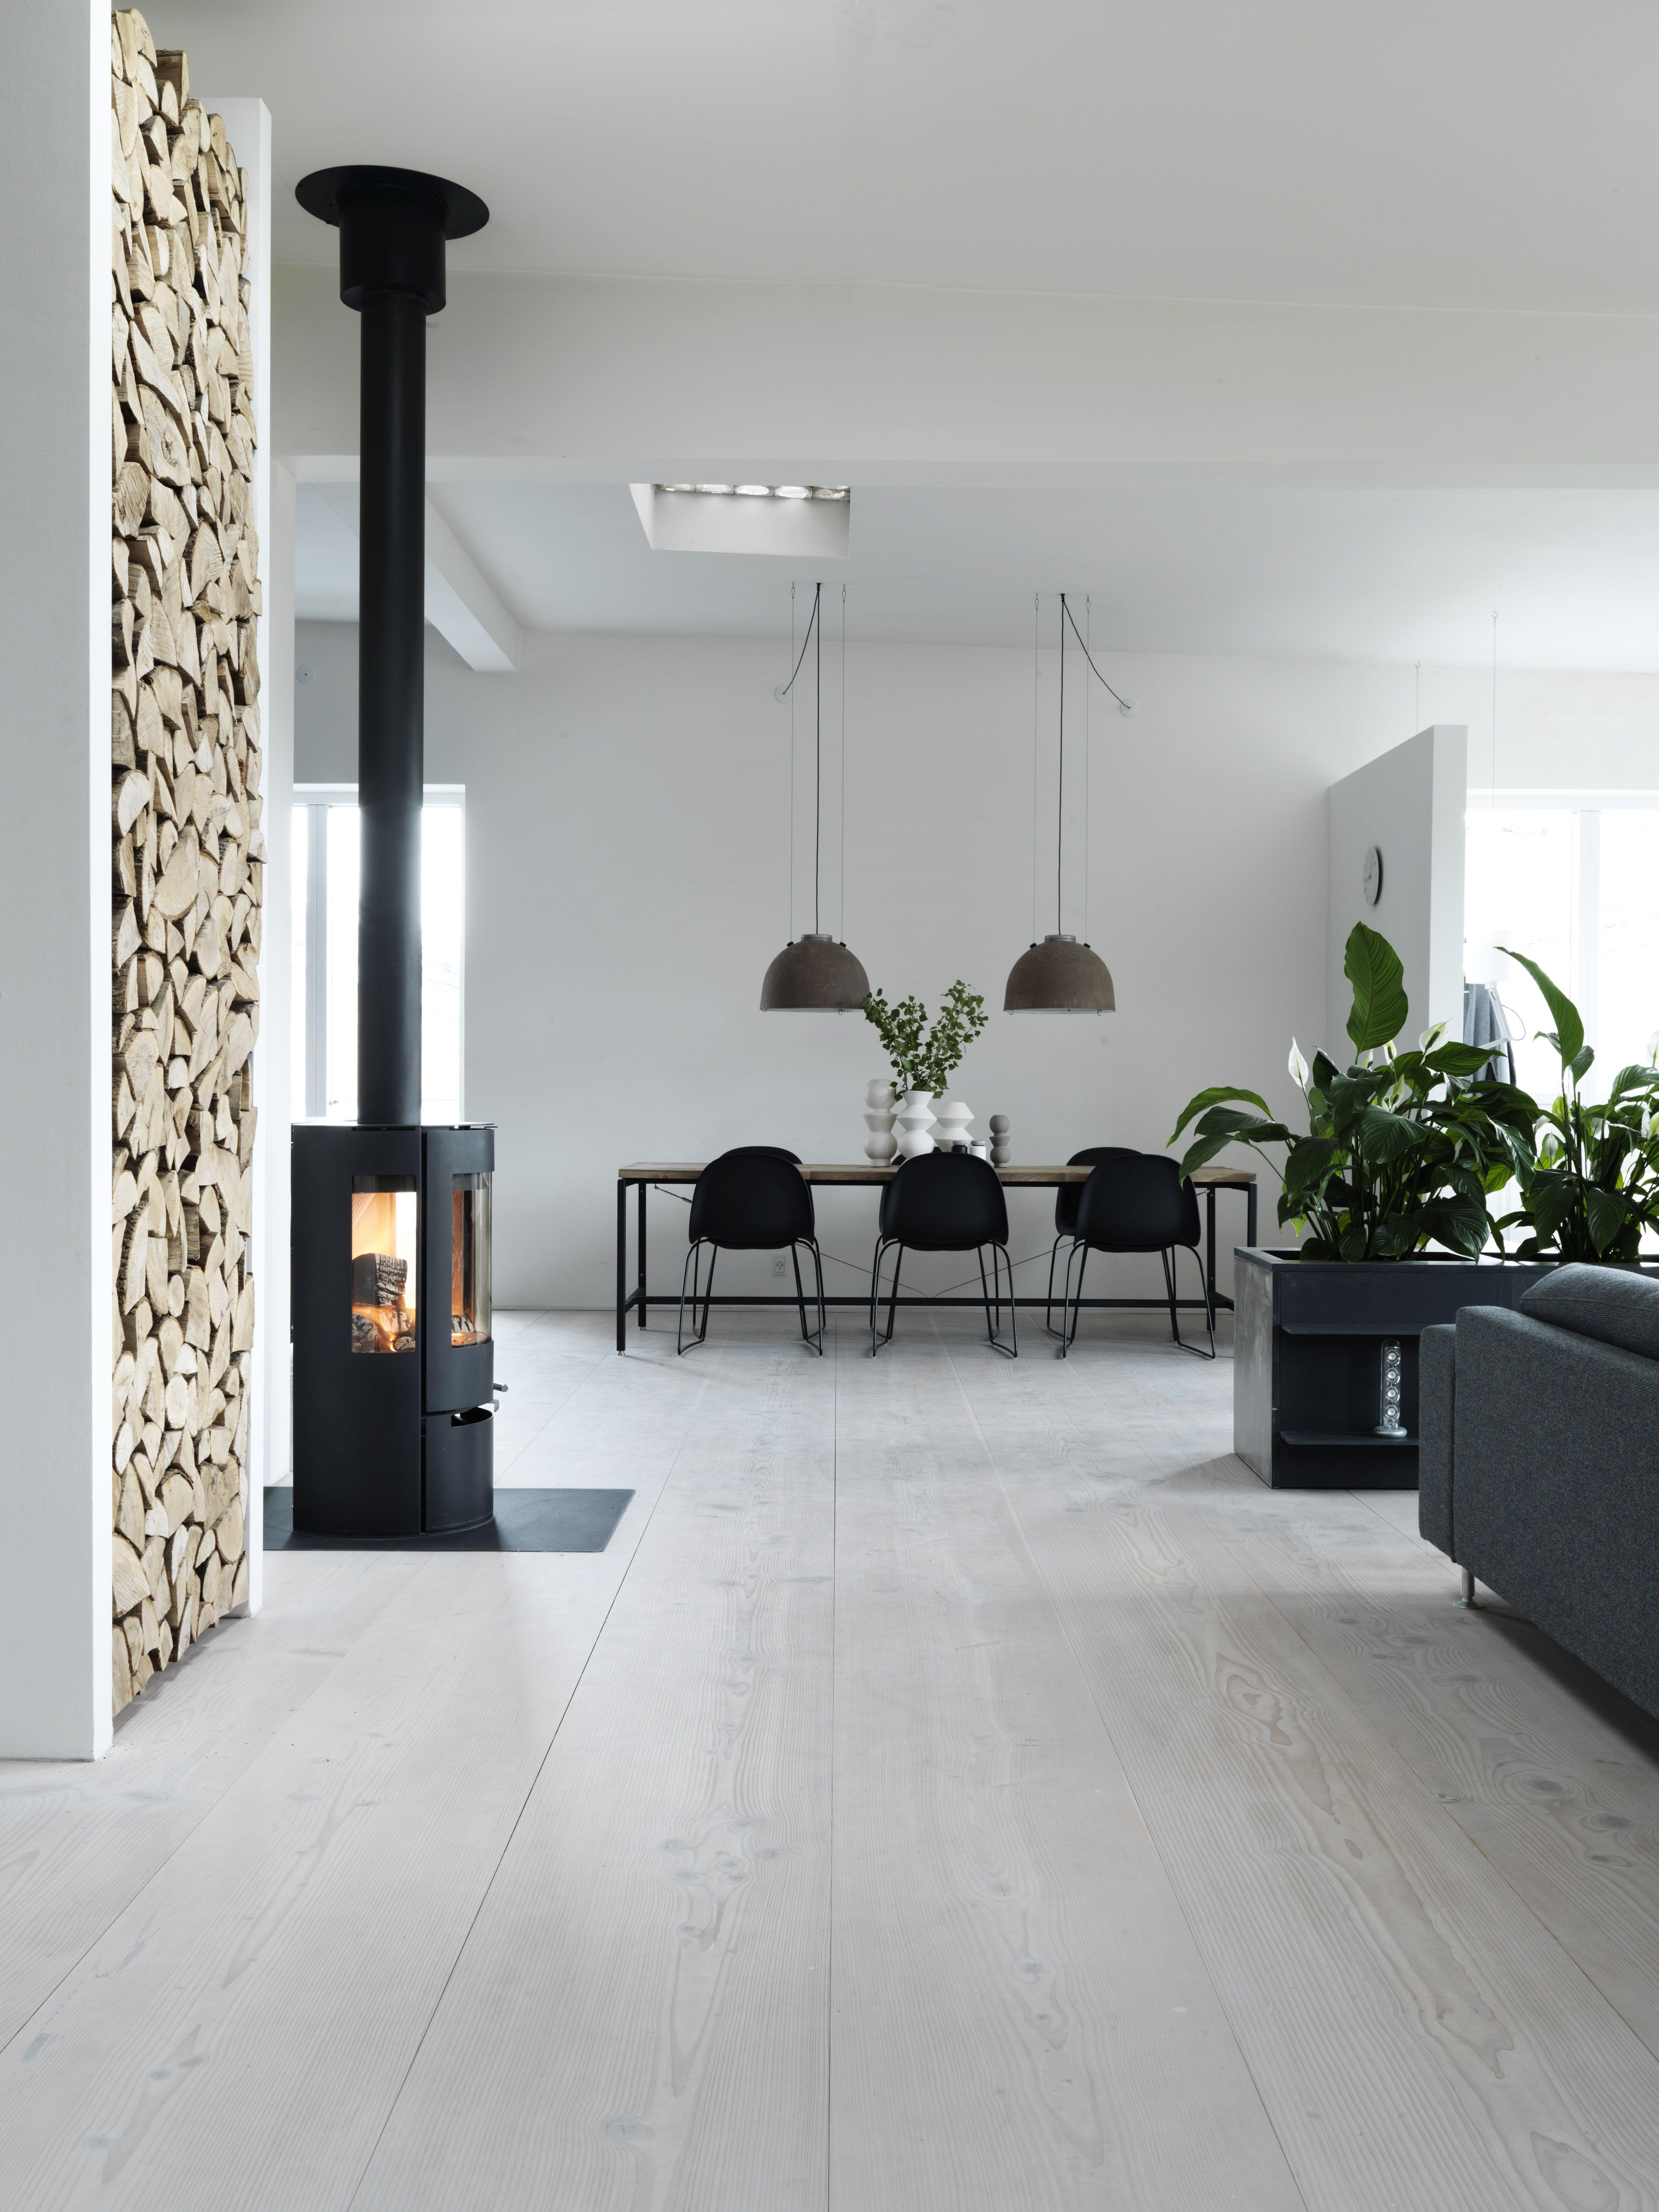 I wish I lived here: a New York-style loft in Copenhagen